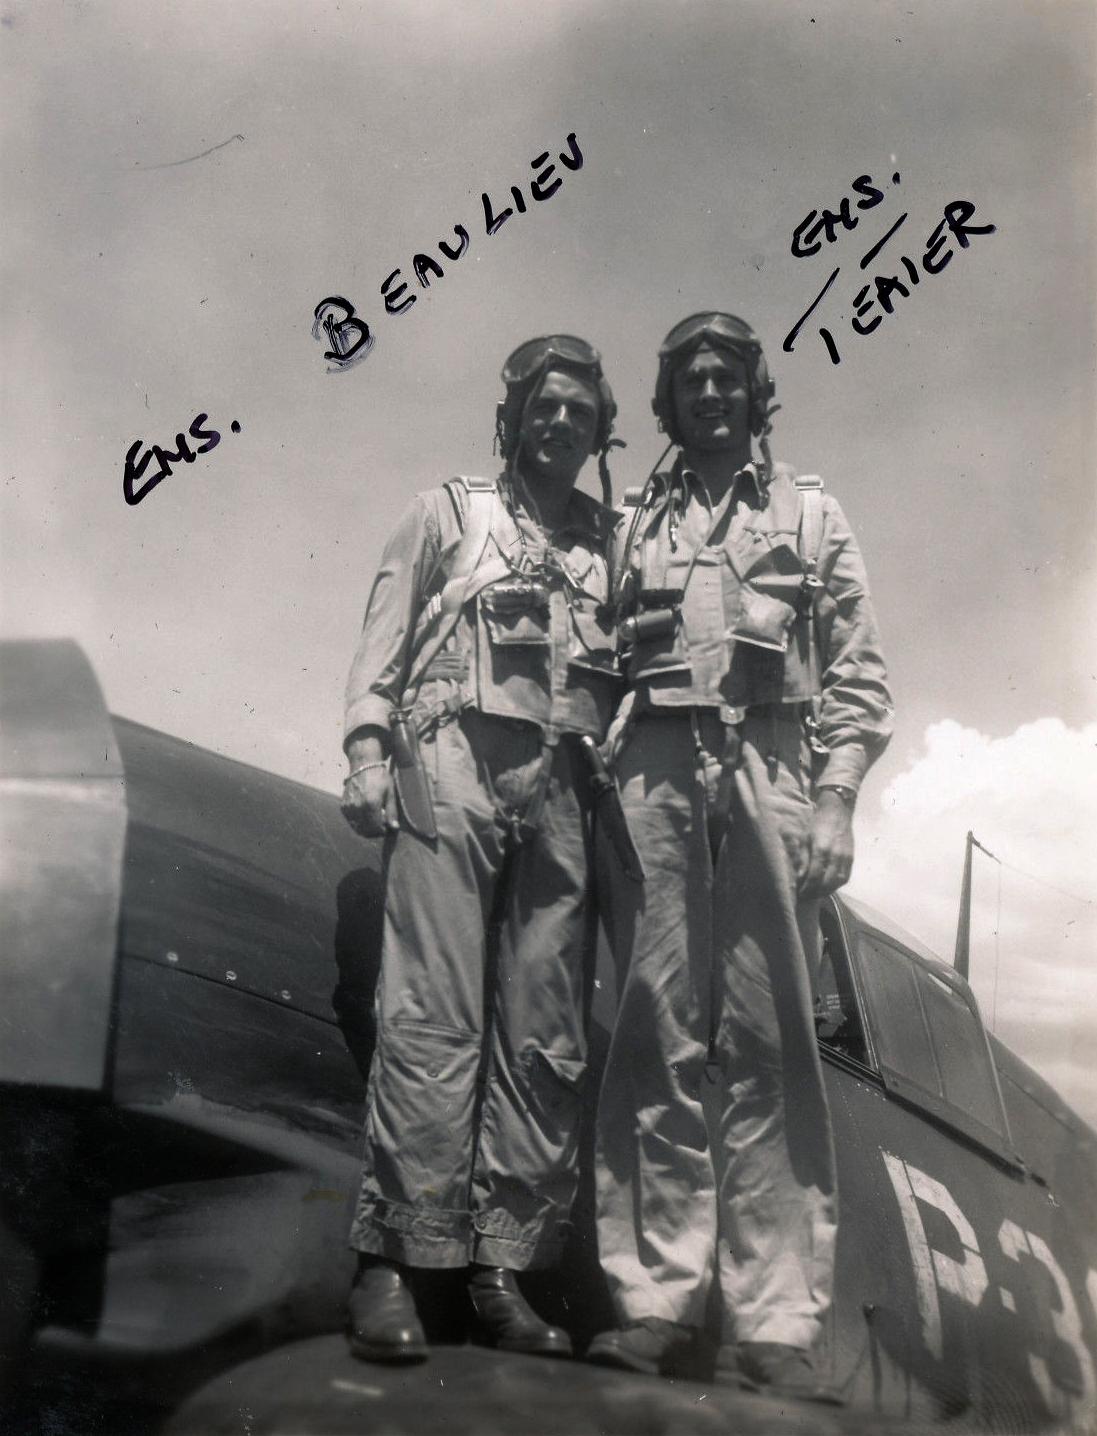 Aircrew USN VBF 8 Ens Beaulieu Ens Teater NAS Puunene 1945 01